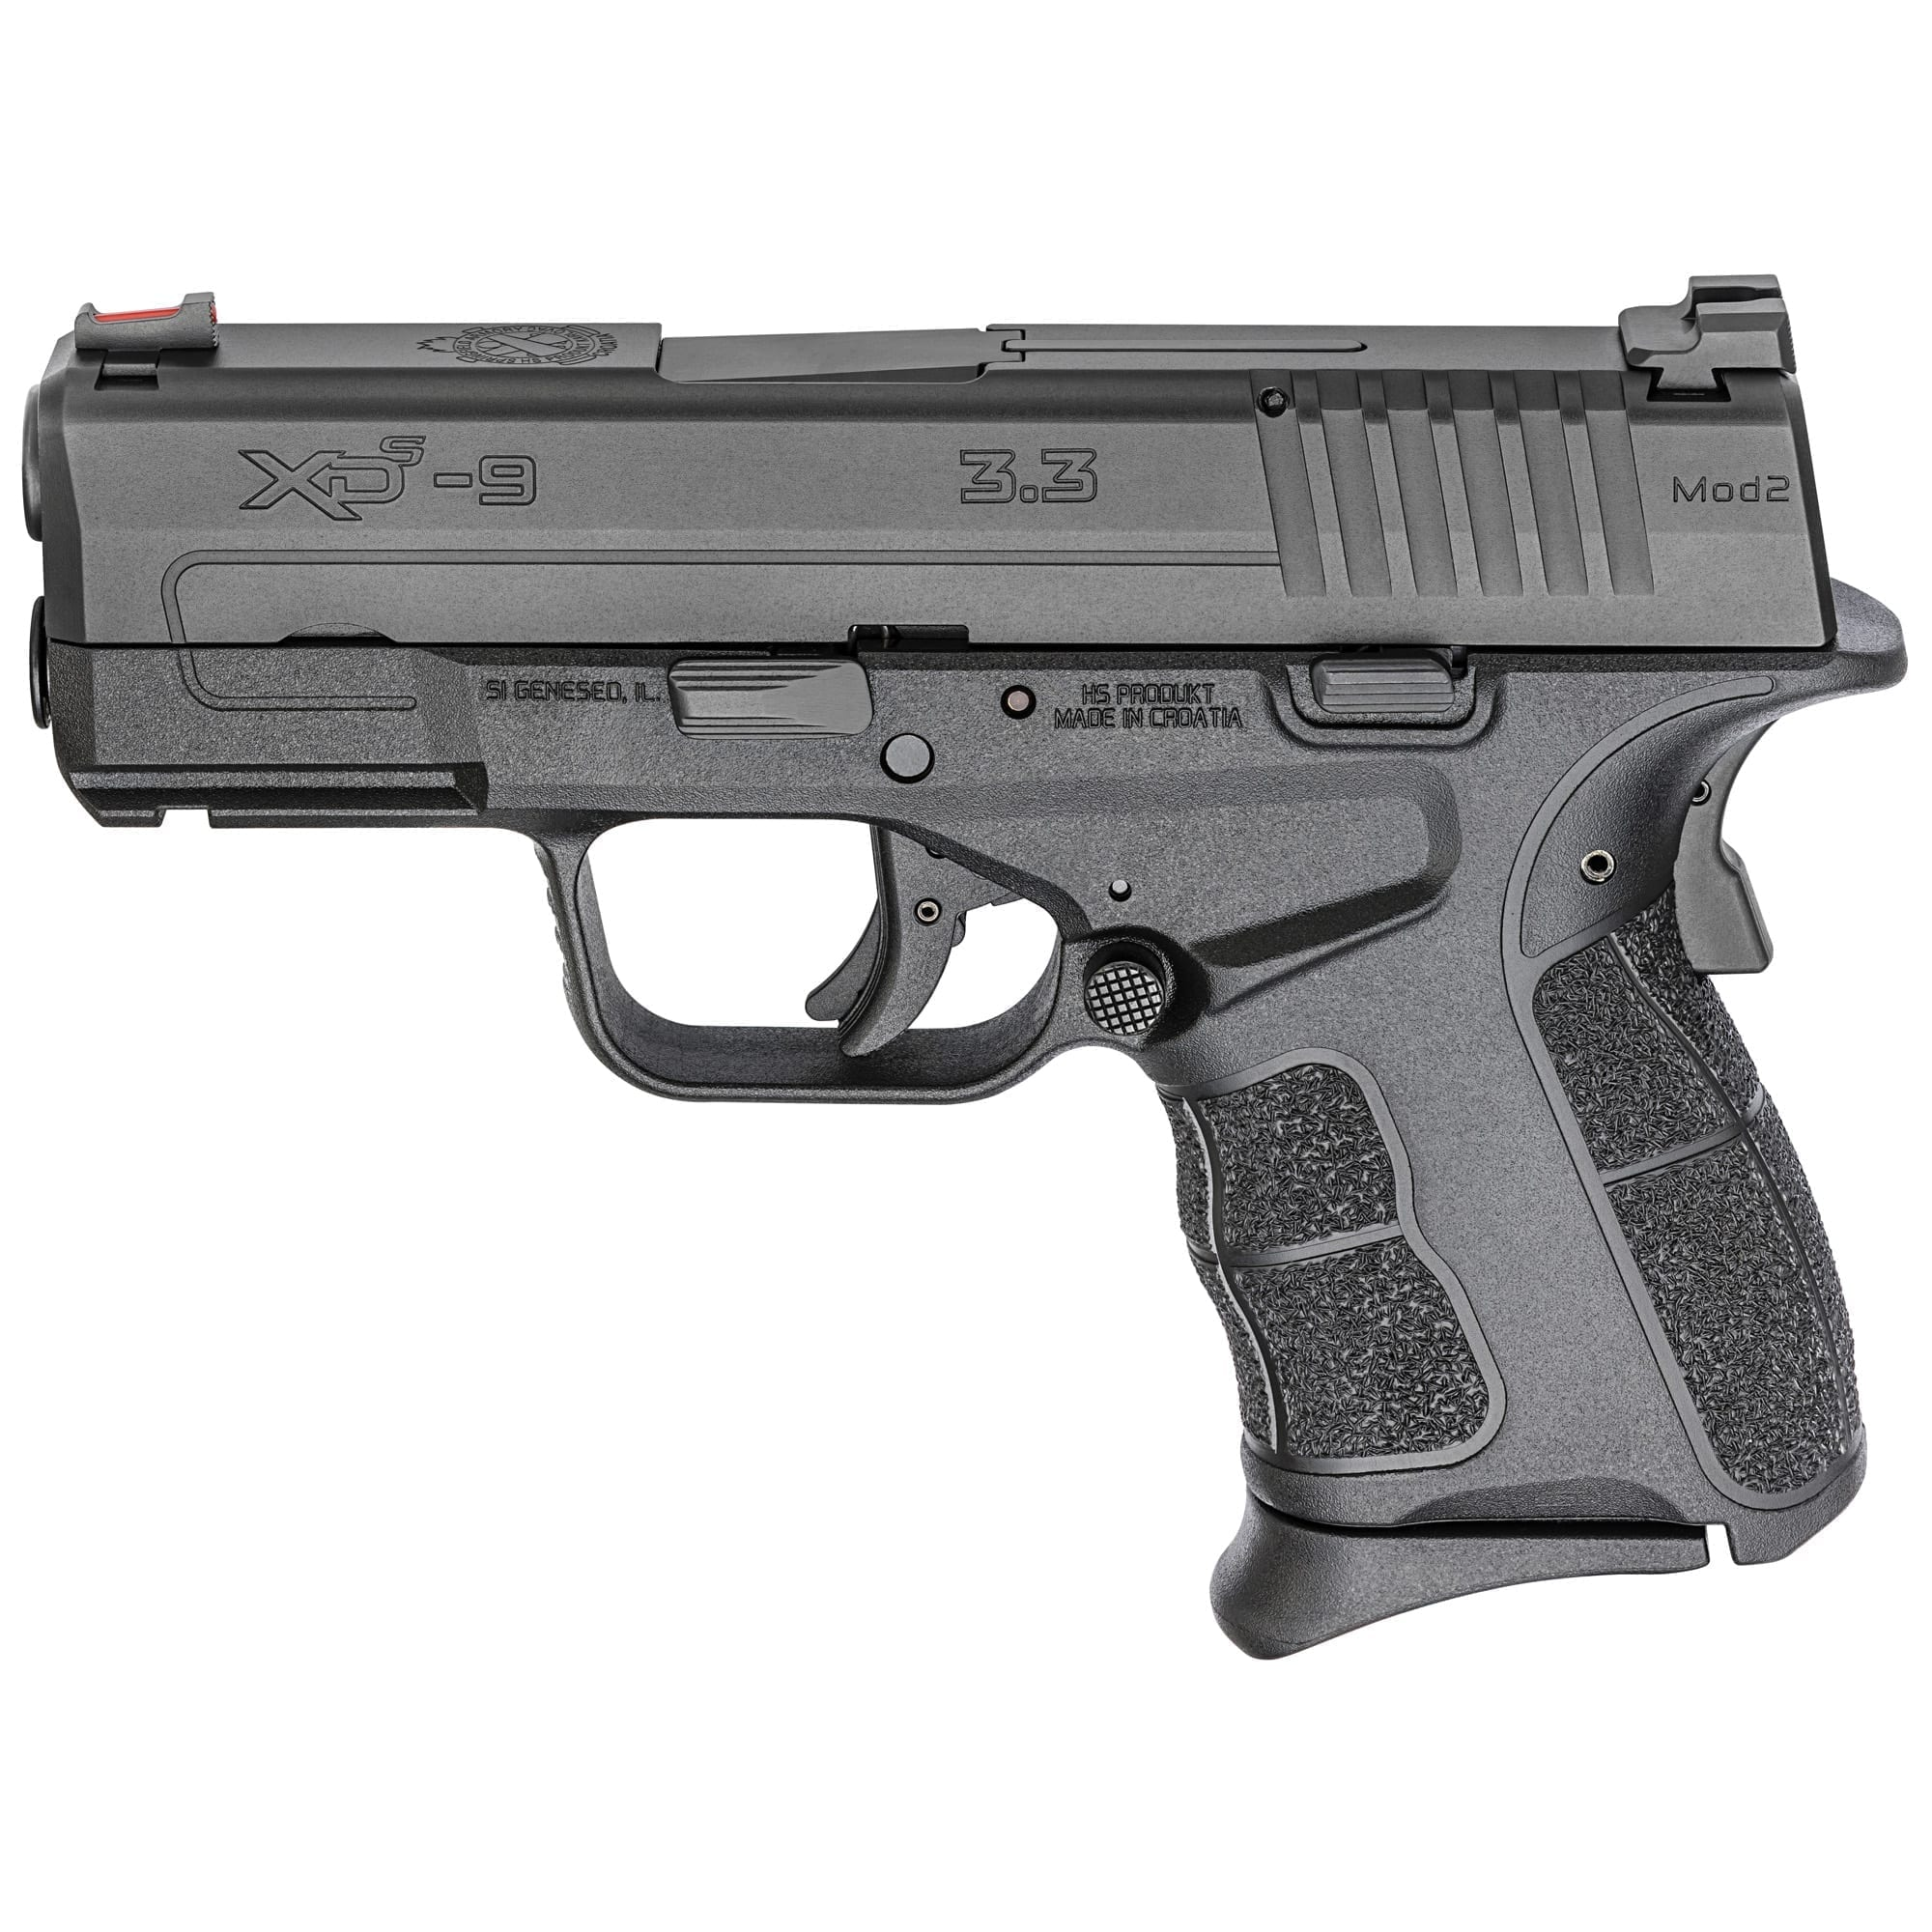 Springfield Armory XDSG9339BIGU XD-S Mod.2 9mm Luger